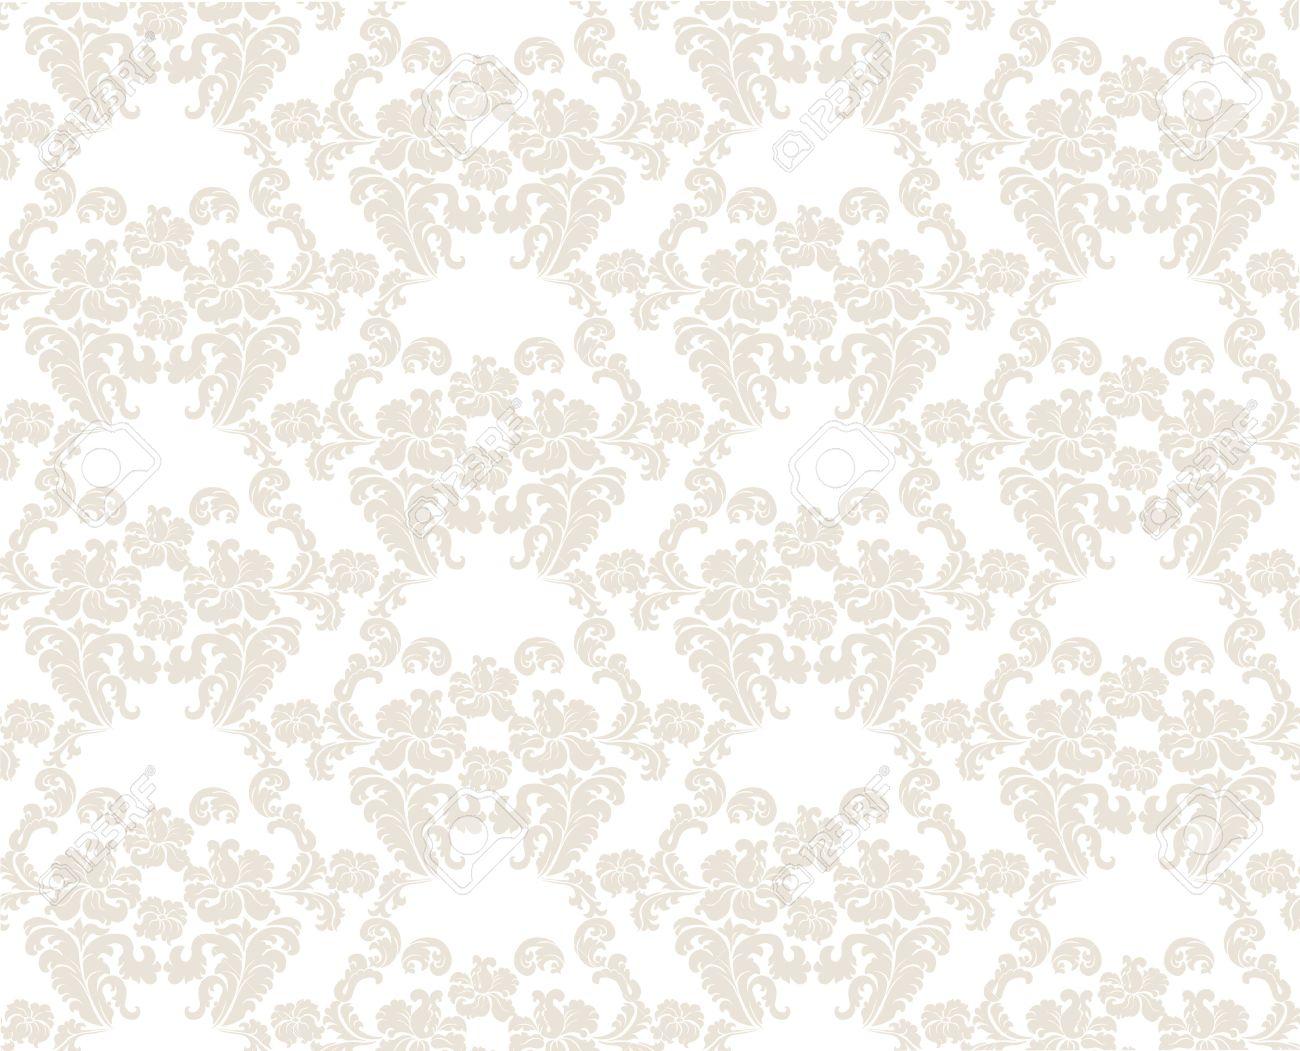 Vintage Elegant Lily Flower Ornament Multiple Pattern Luxury